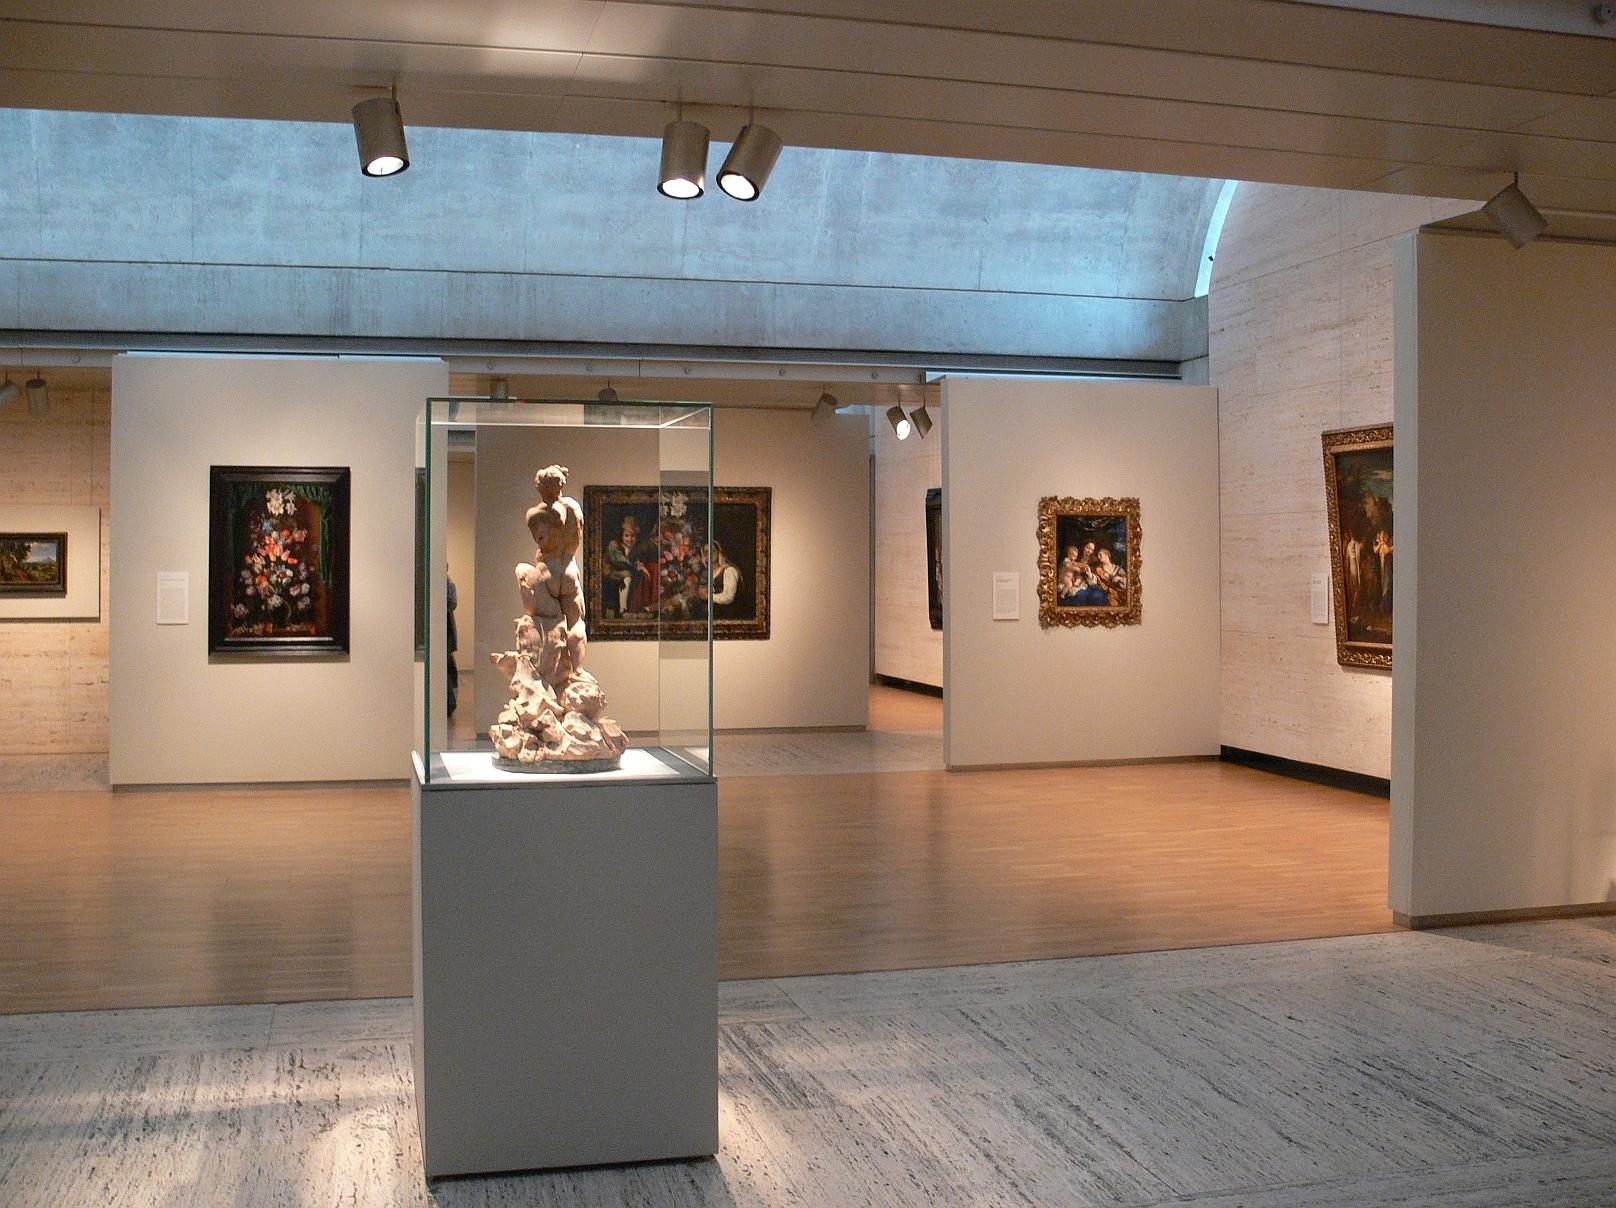 Kimberlly art museum